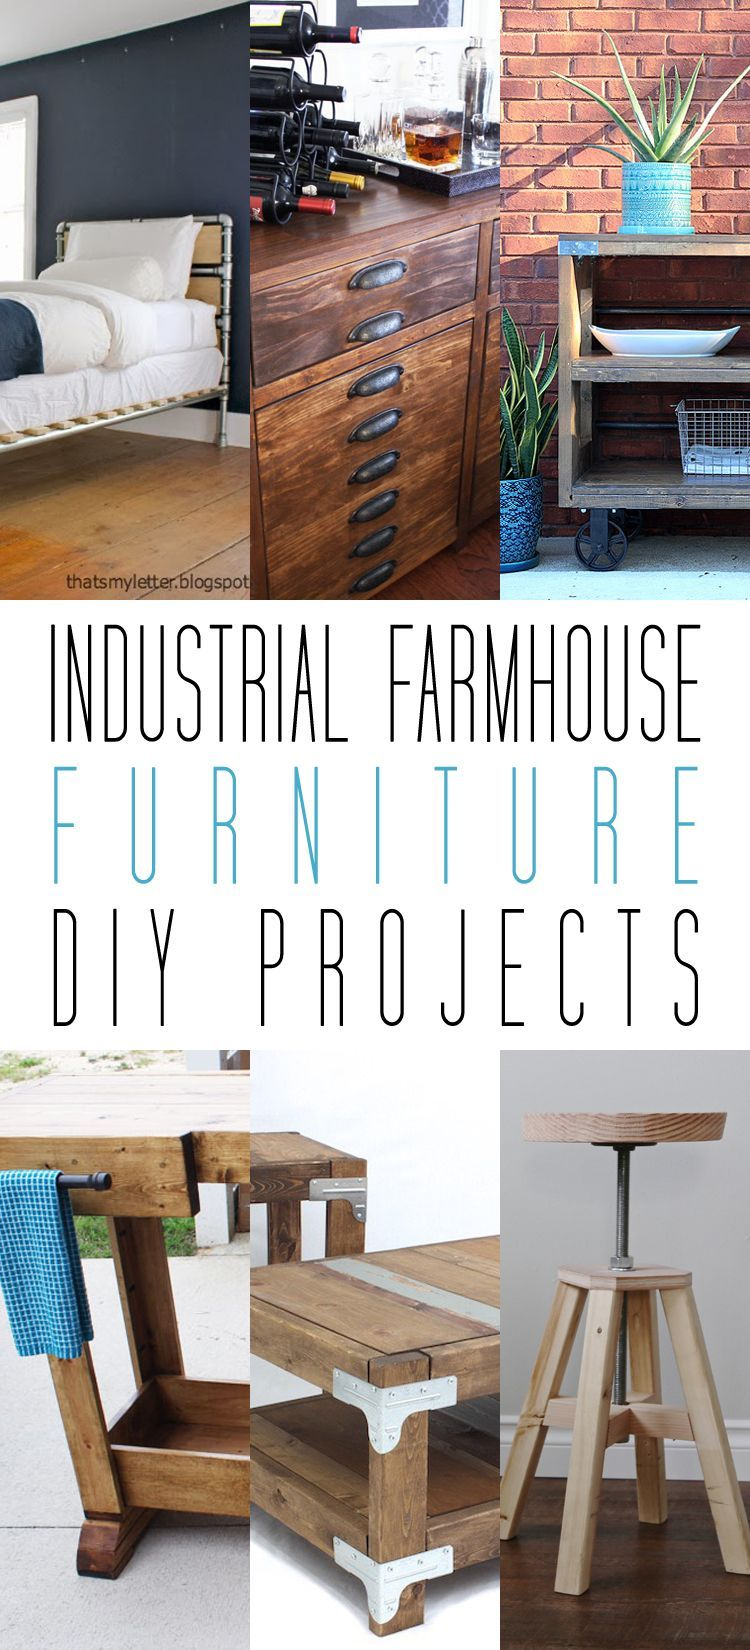 Industrial Farmhouse Furniture Diy Projects Weekend Diy Diy